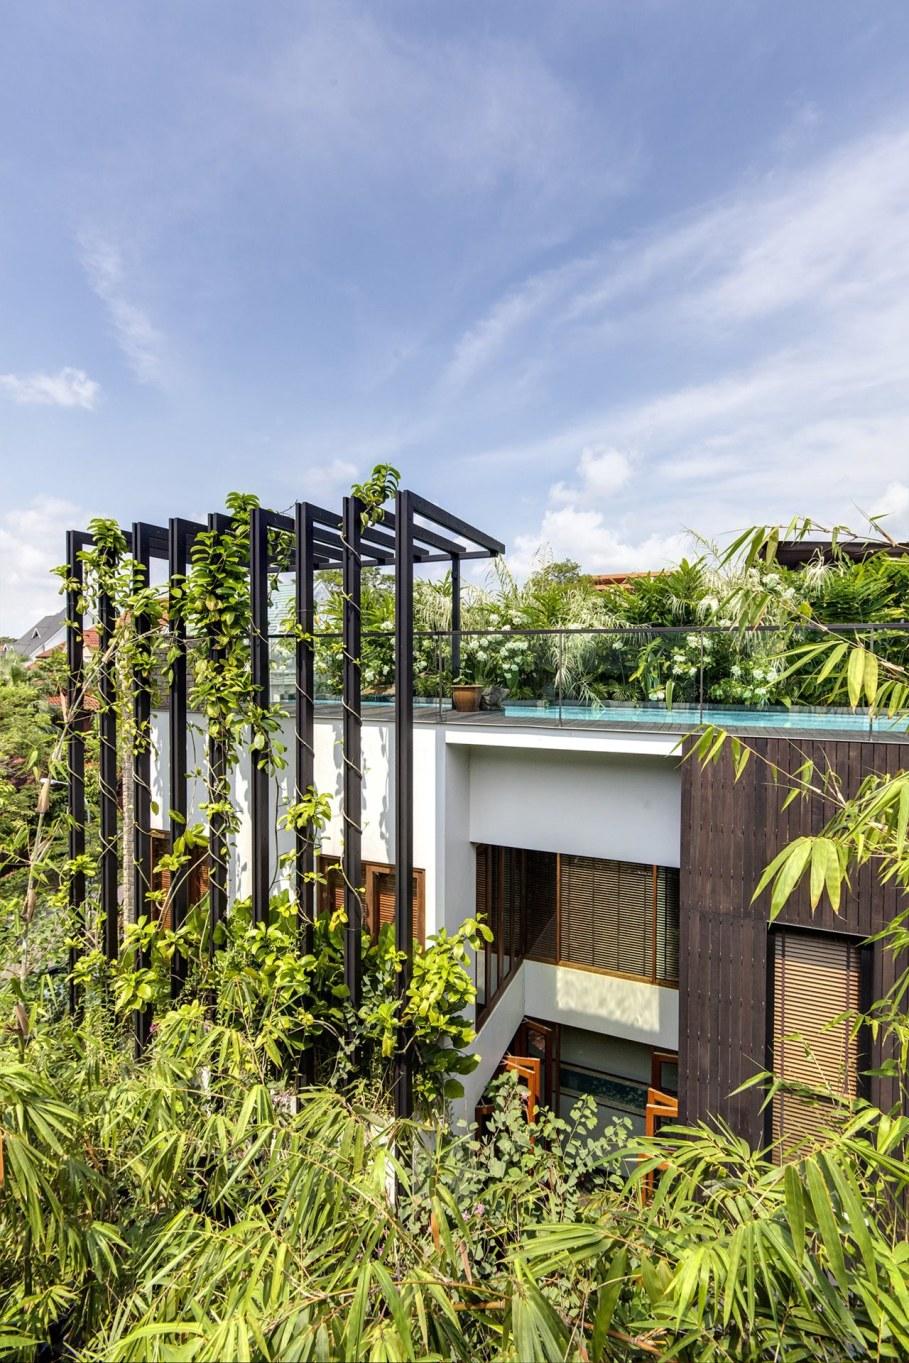 Tan's Garden Villa in Singapore - the outside view